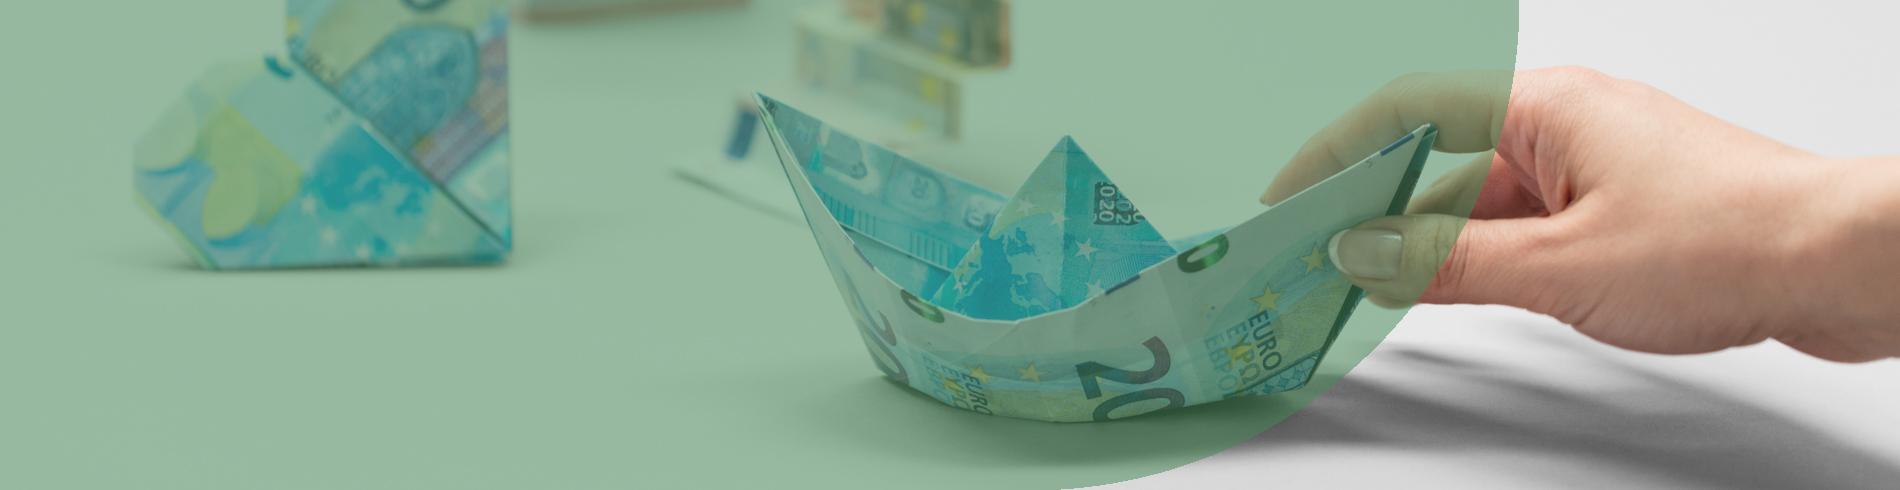 promocion-seguro-fondos-inversion